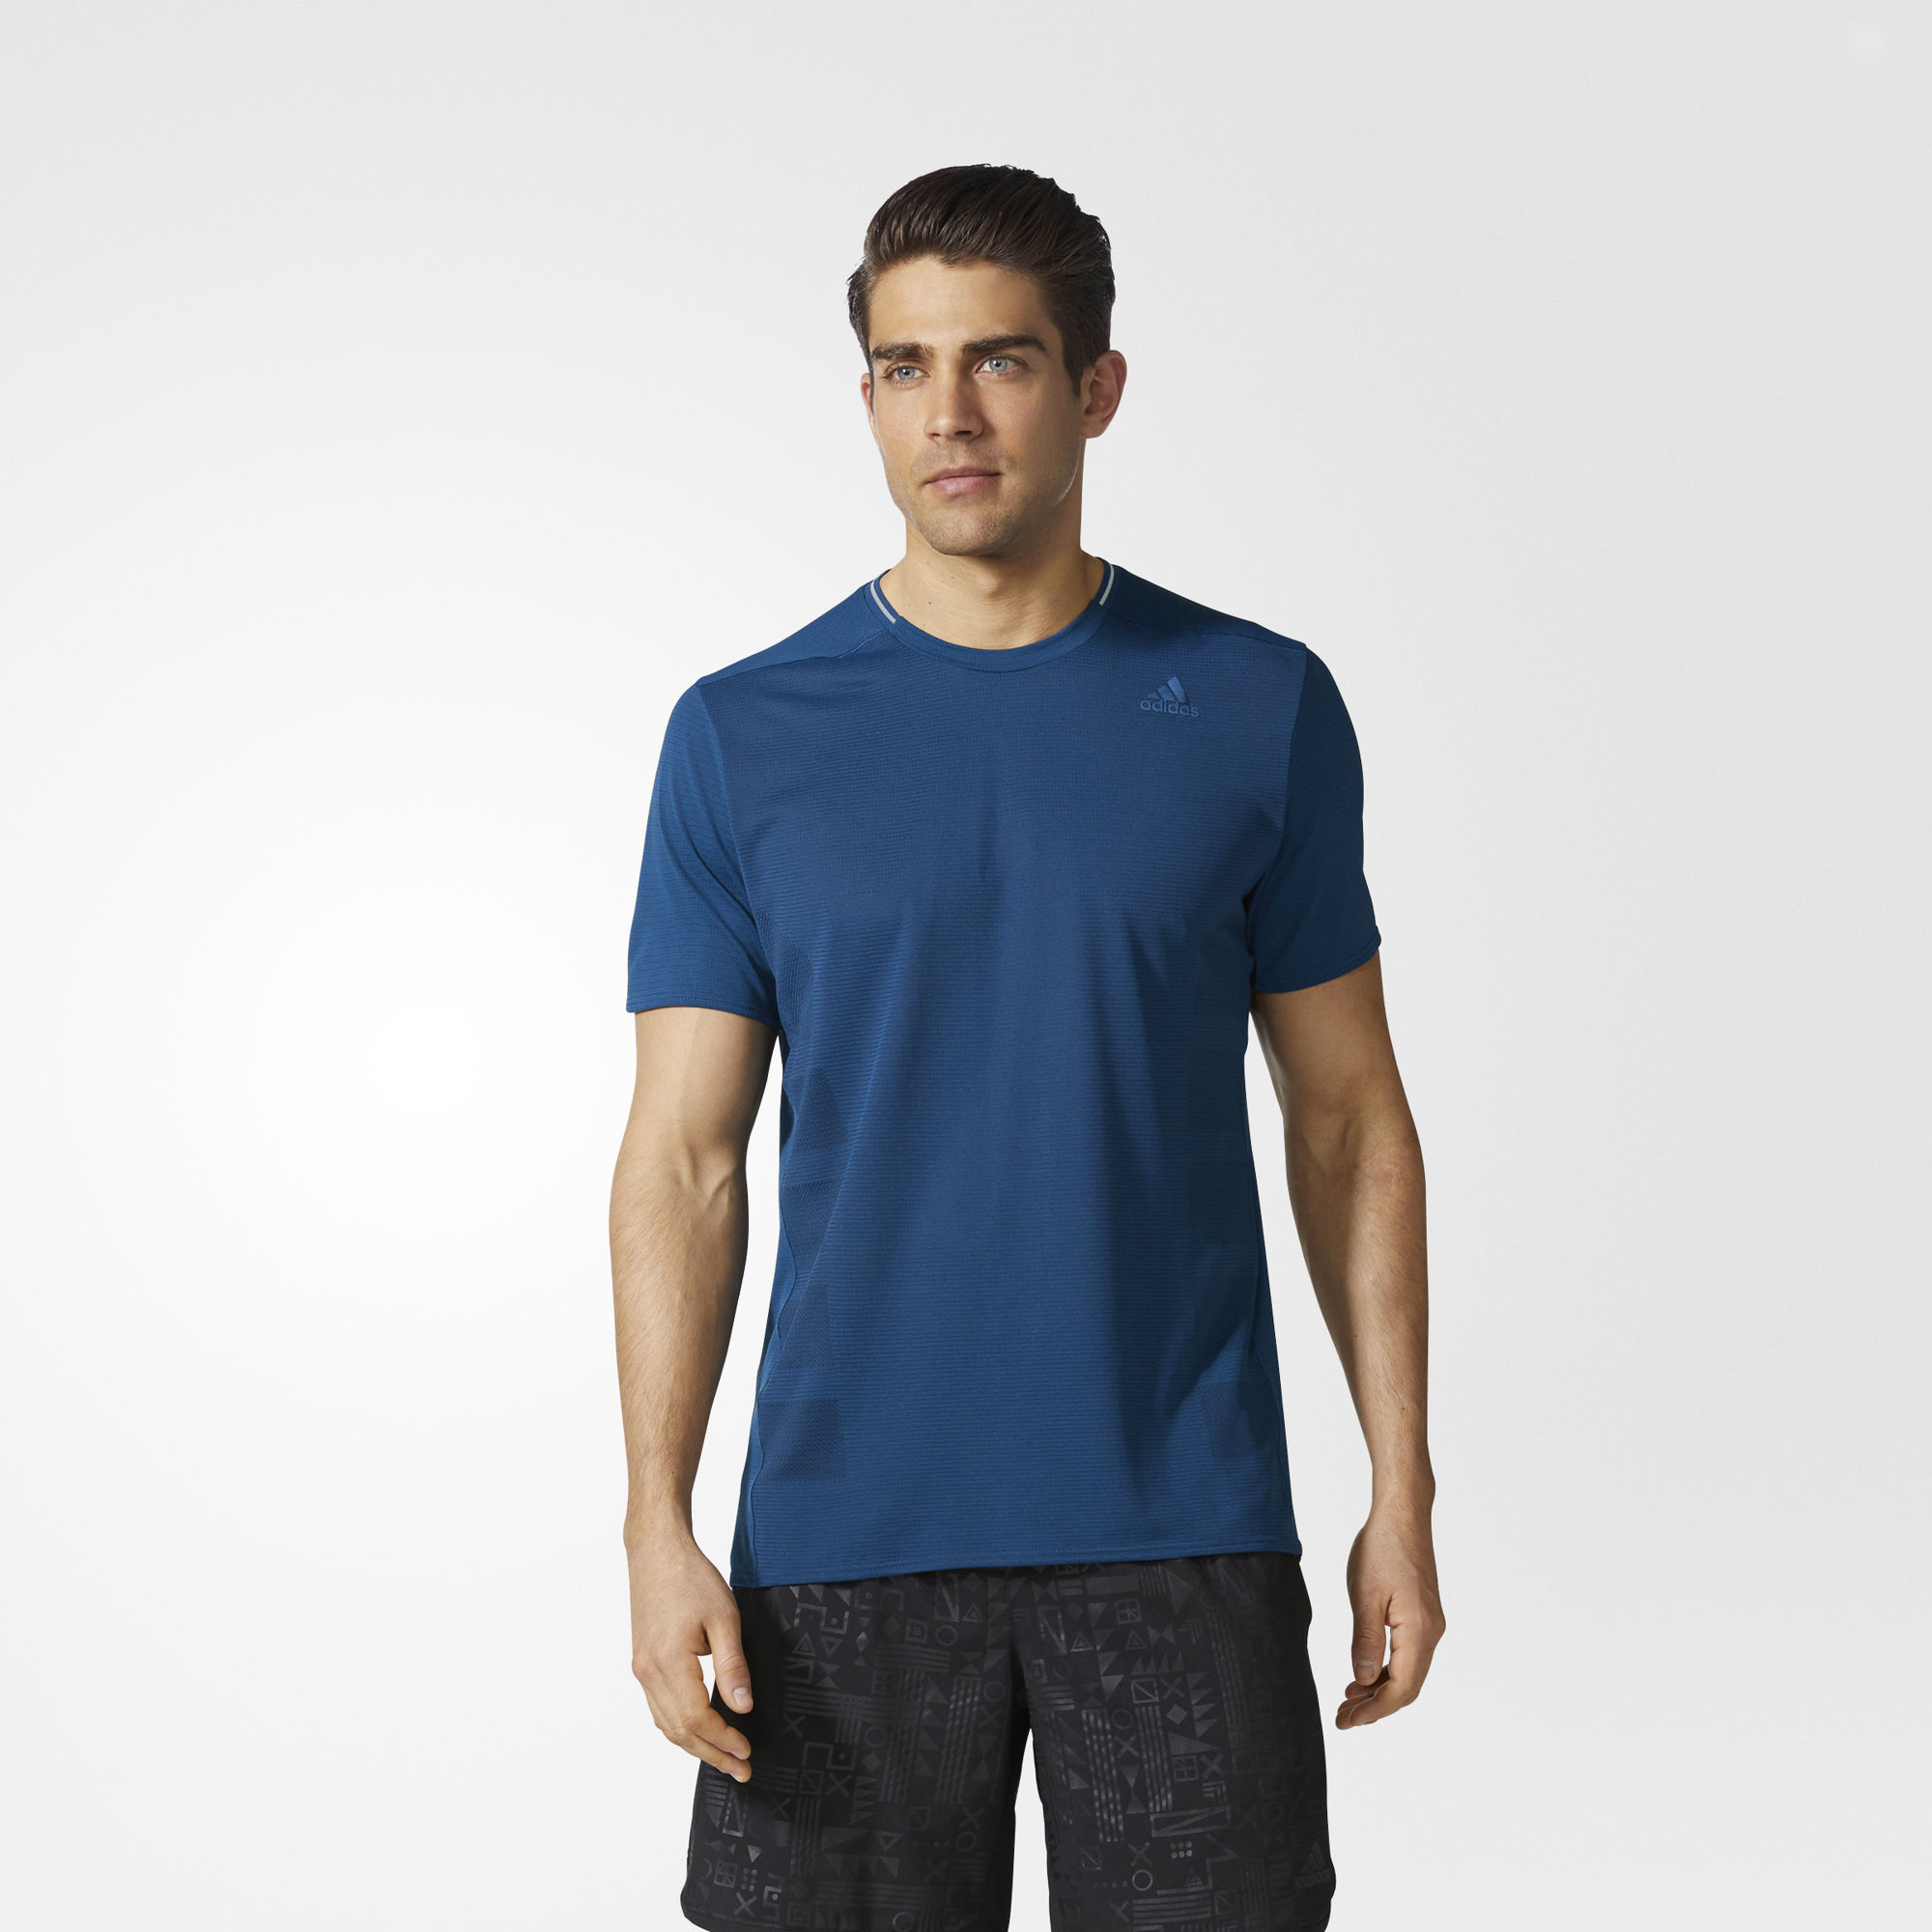 adidas Supernova Short Sleeve Tee in Blau